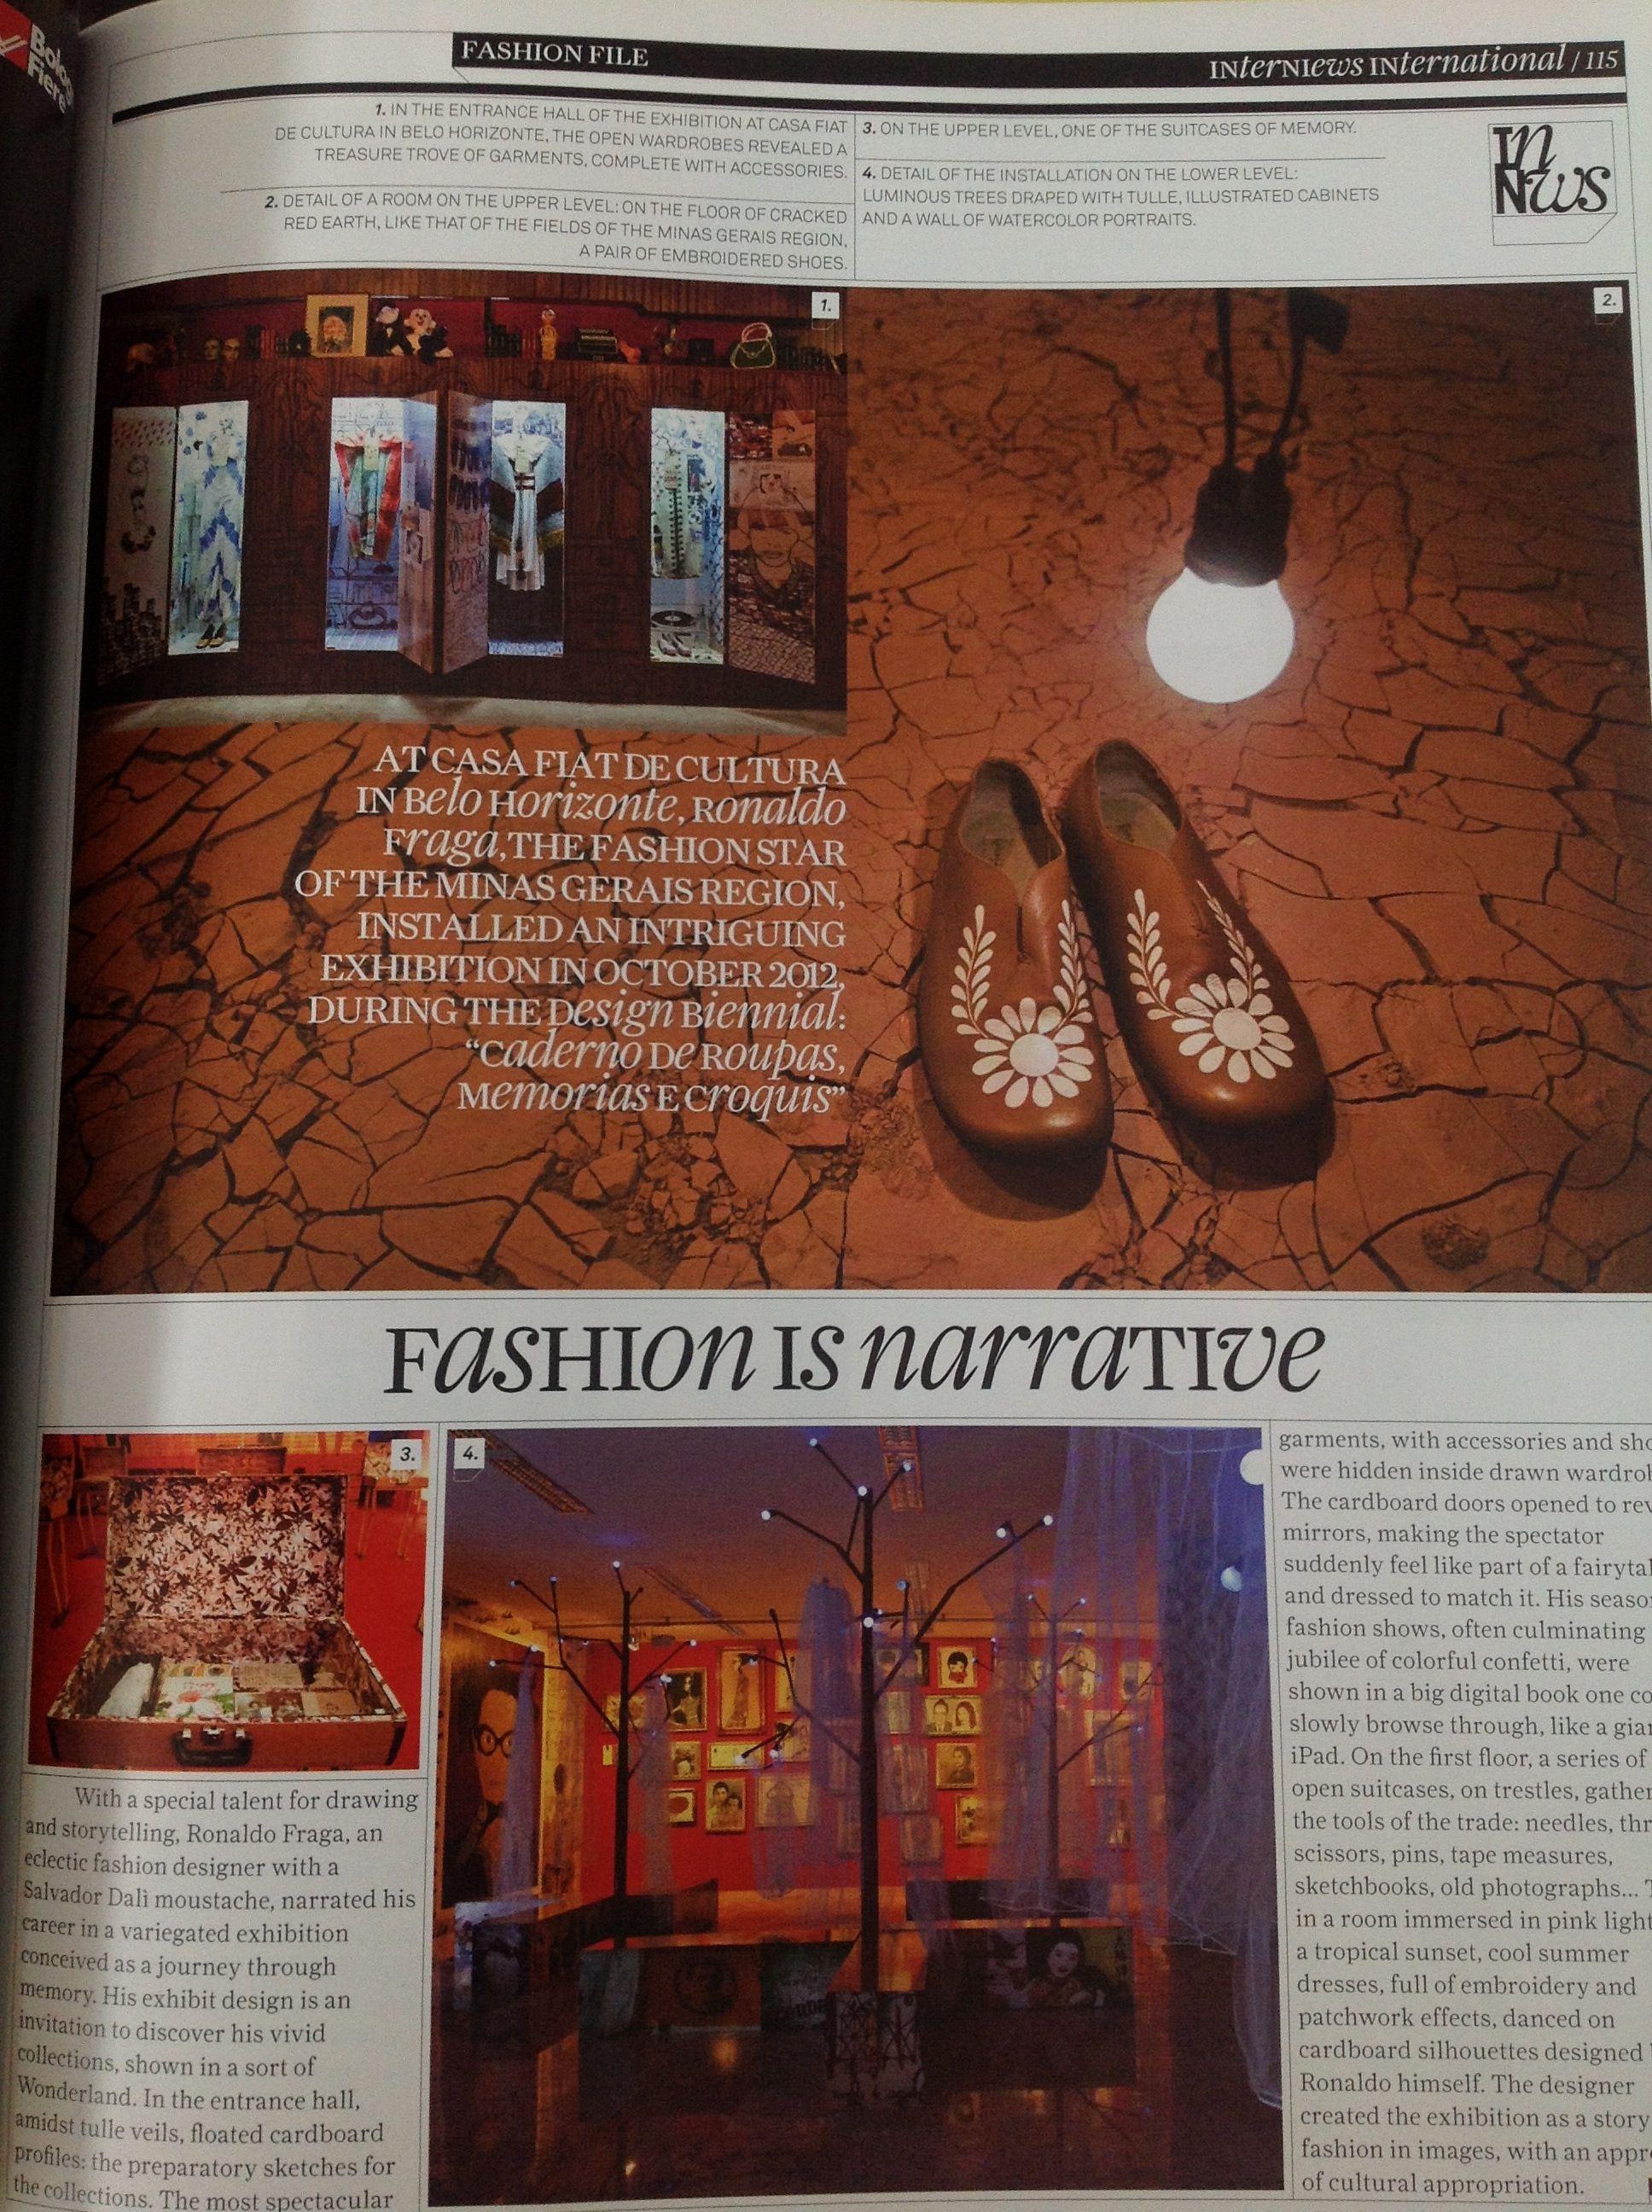 fashion is a narrative